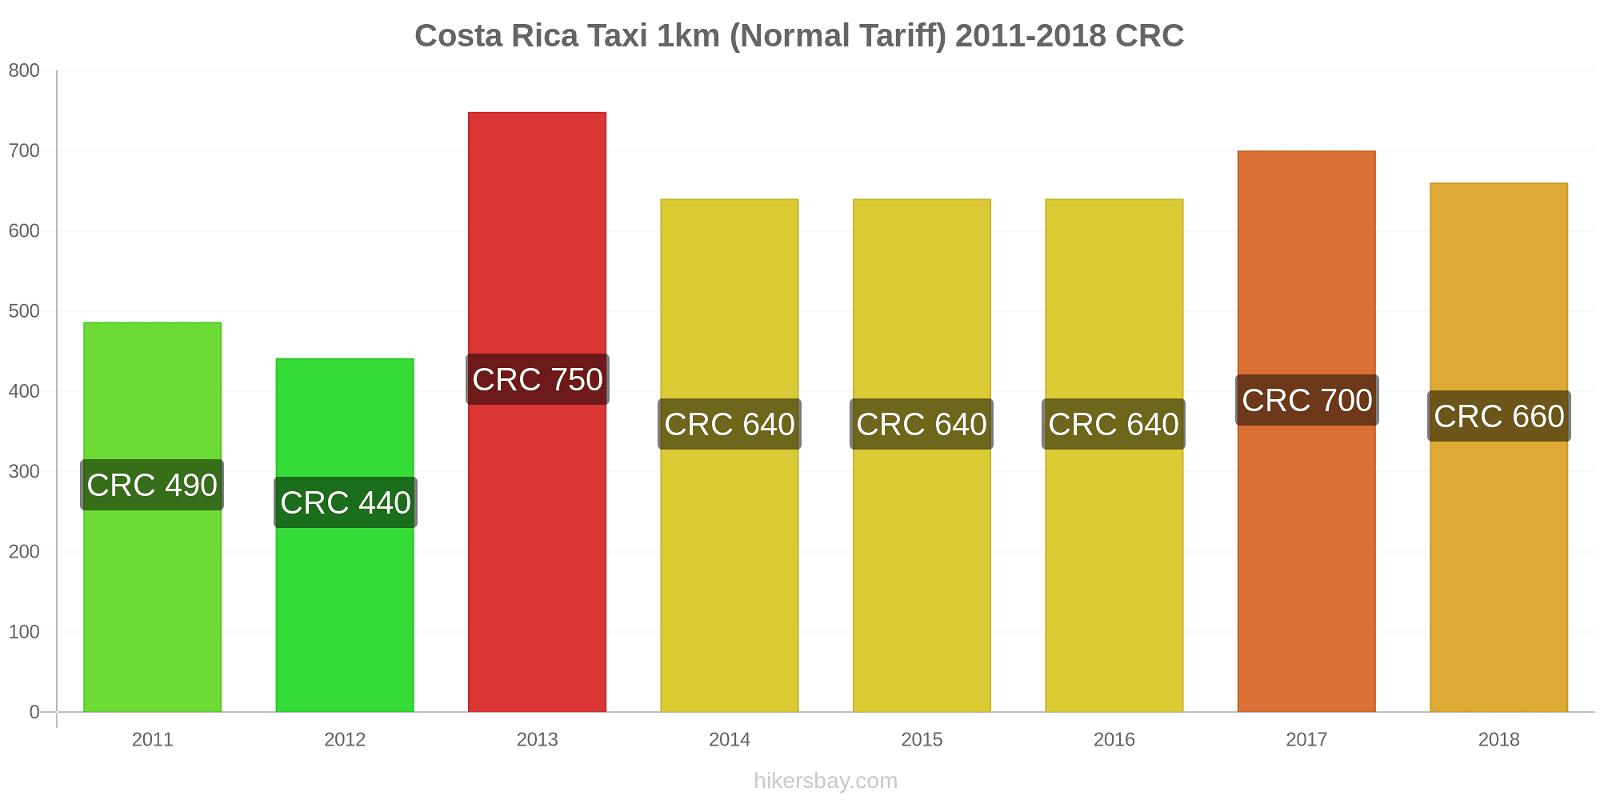 Costa Rica price changes Taxi 1km (Normal Tariff) hikersbay.com